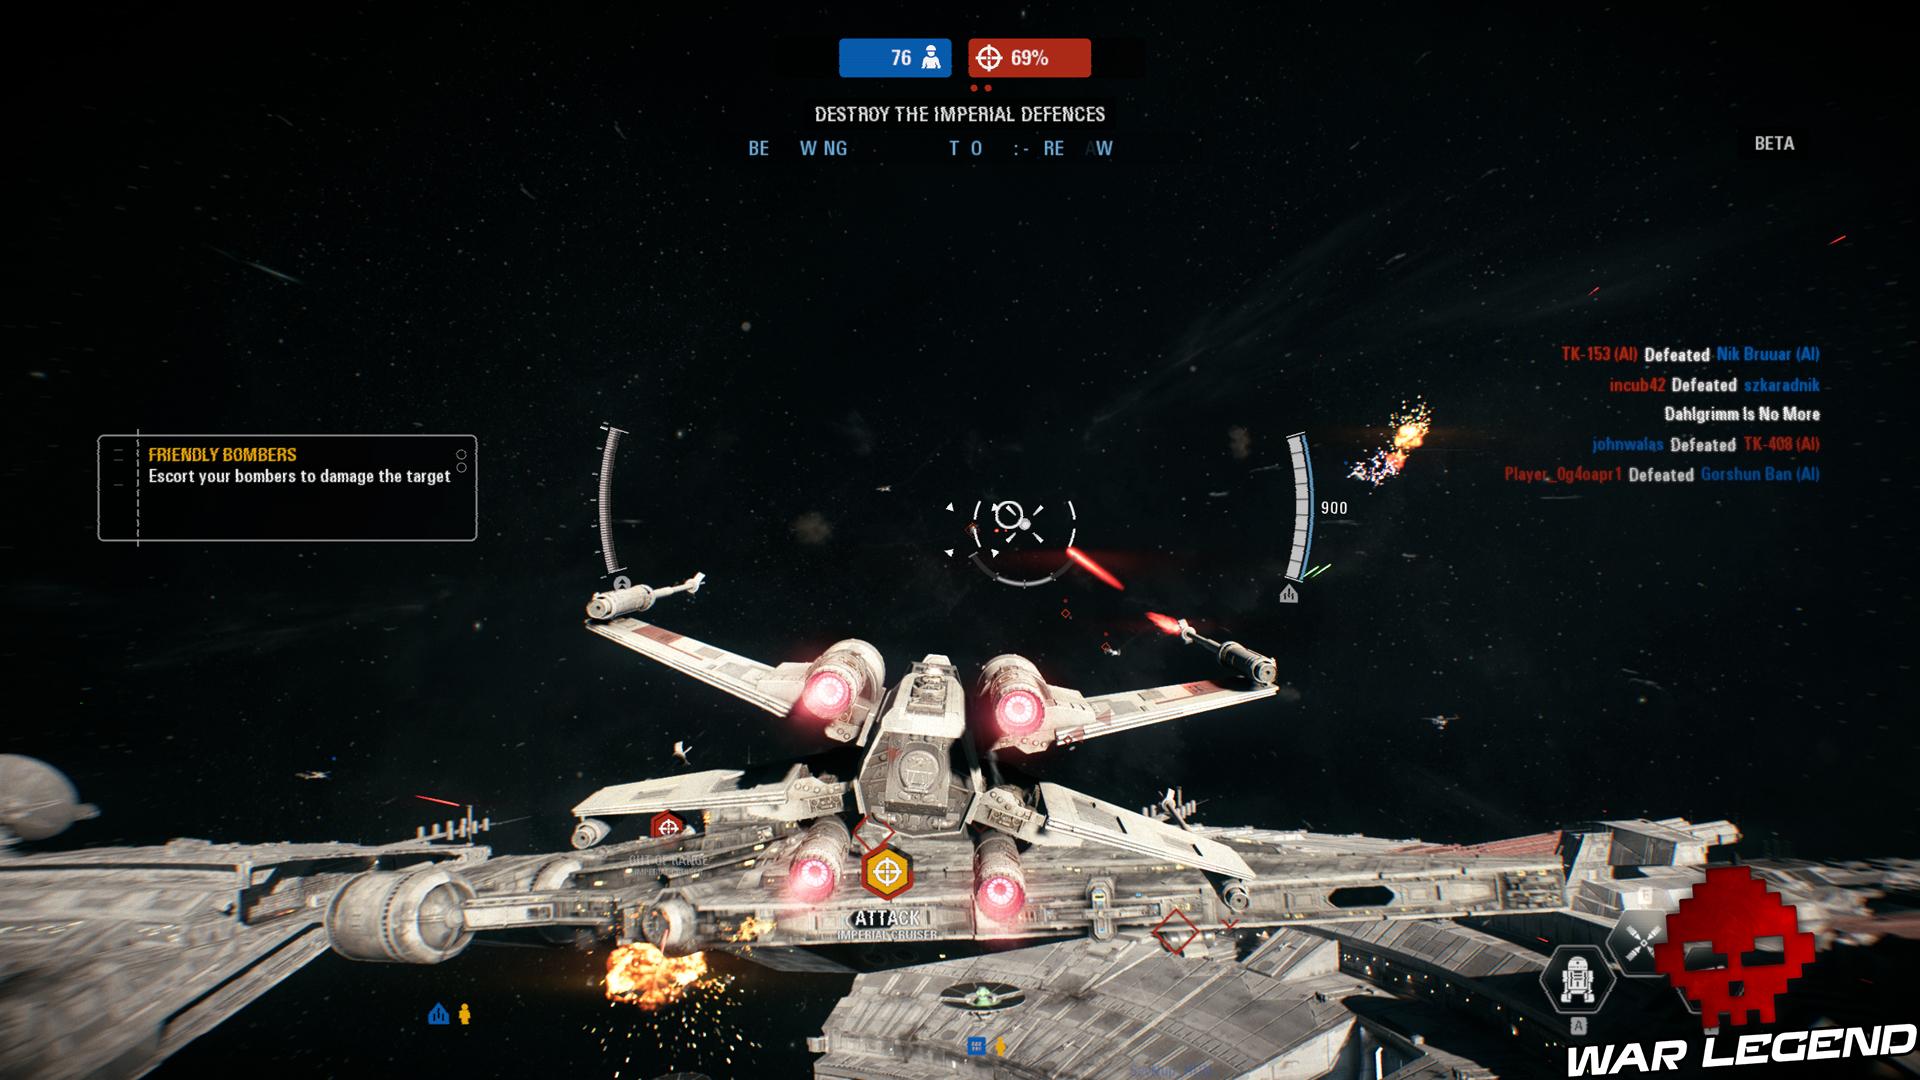 Guide Star Wars: Battlefront II